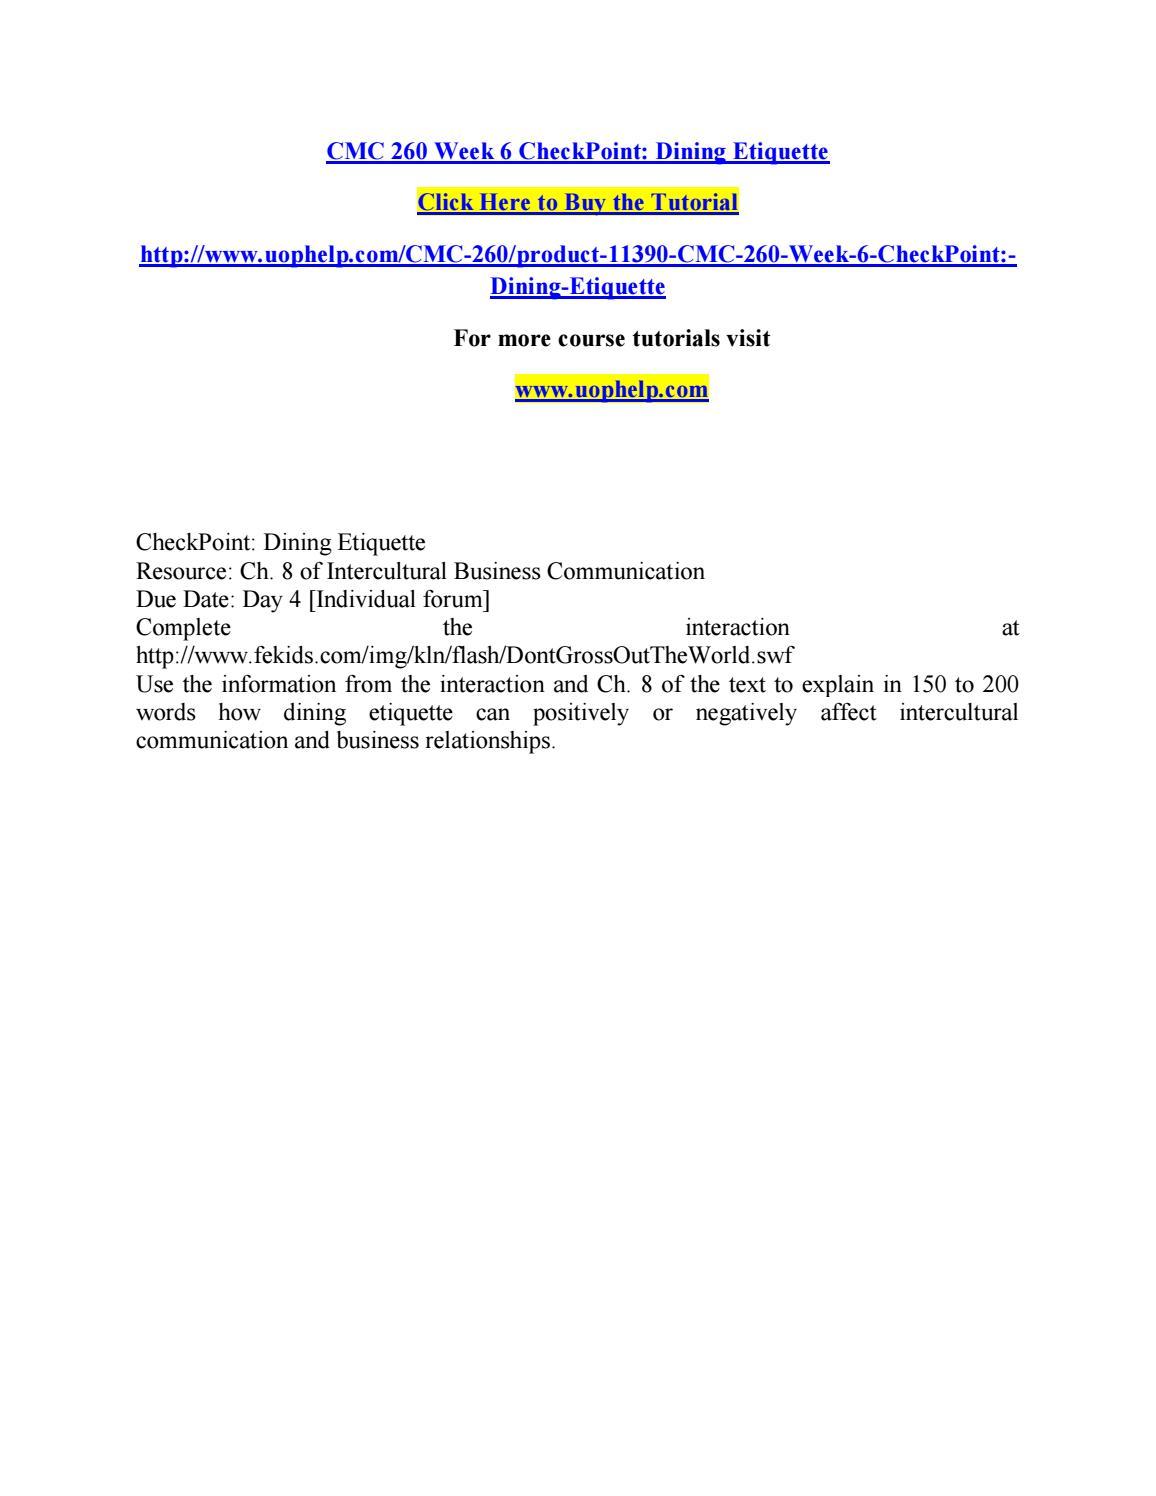 Cmc 260 week 6 checkpoint by pinck129 - issuu